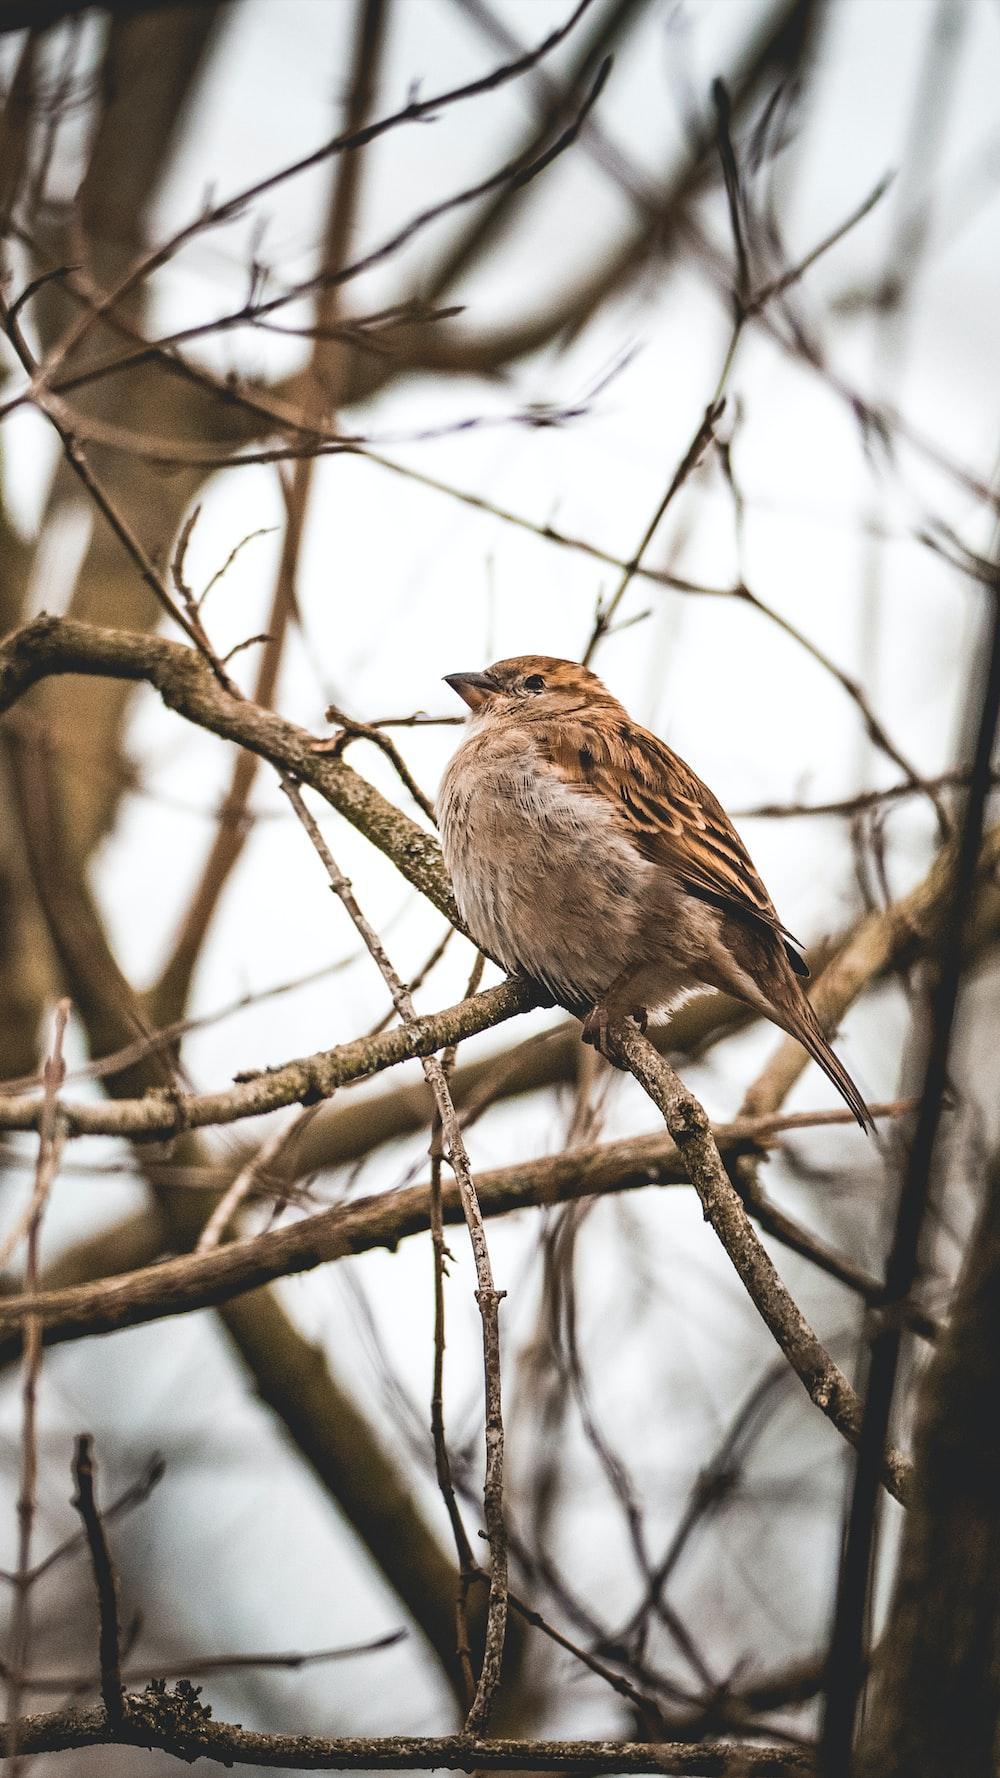 brown sparrow bird on bare tree